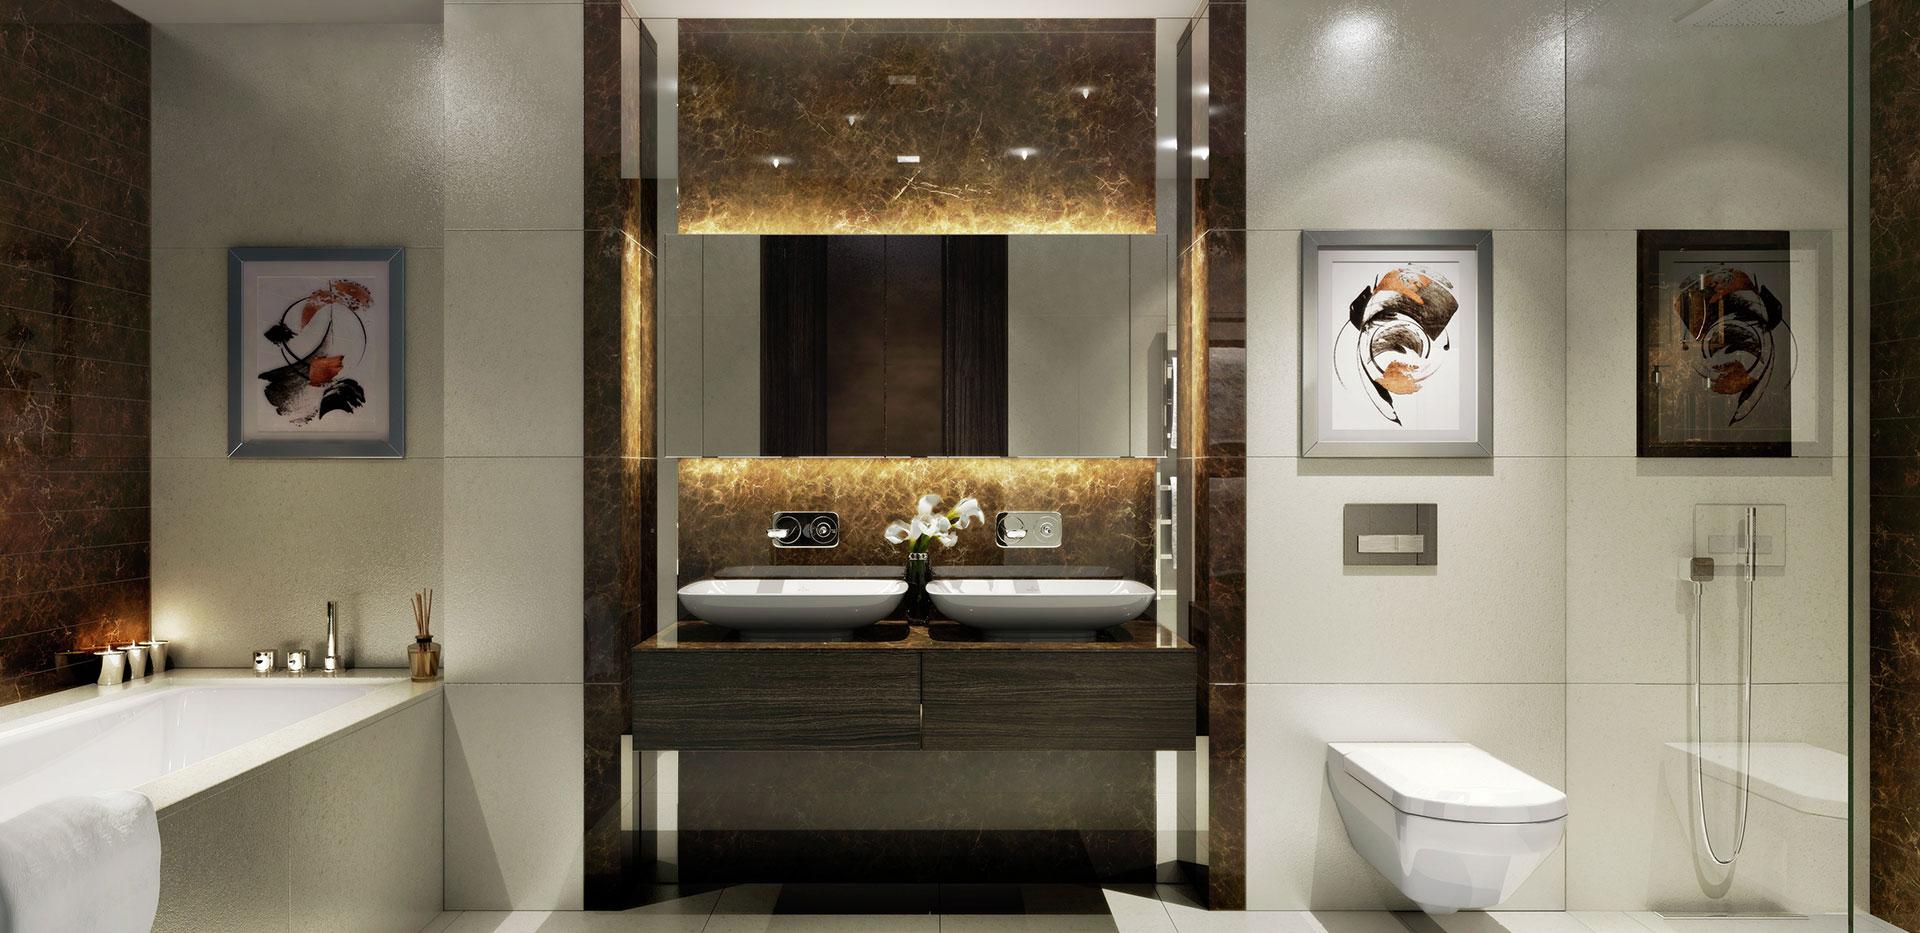 St Edwards, Kensington Row, Mowbray House, Master Bathroom Scheme CGI